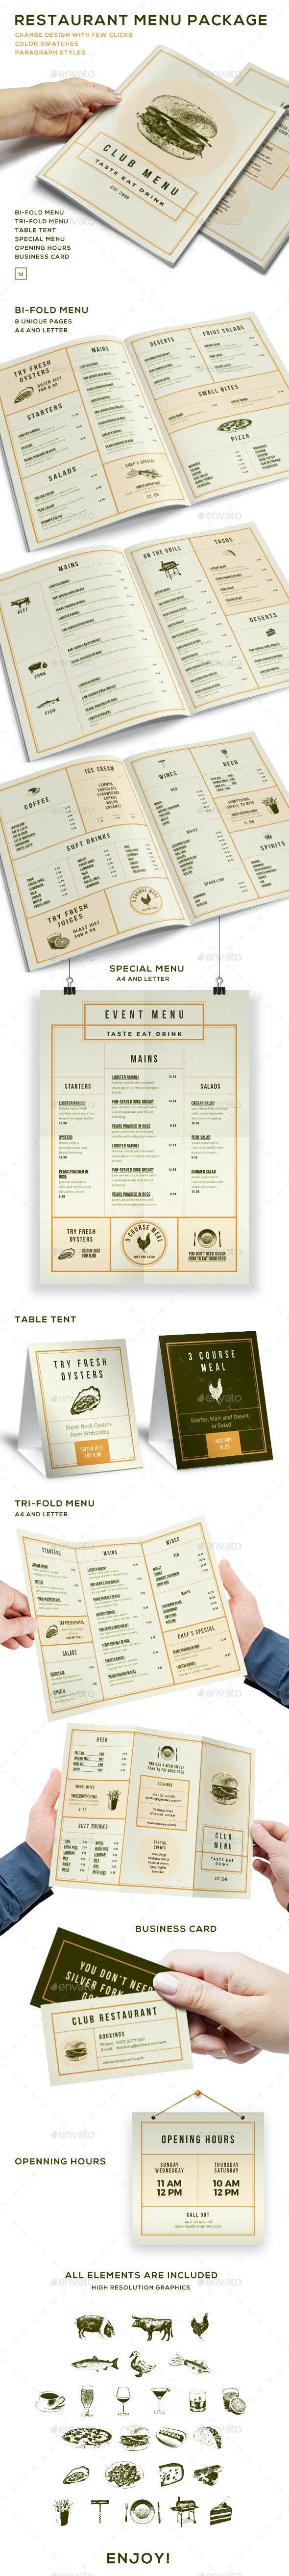 Elegant Food Menu - Restaurant Package - Food Menus Print Templates